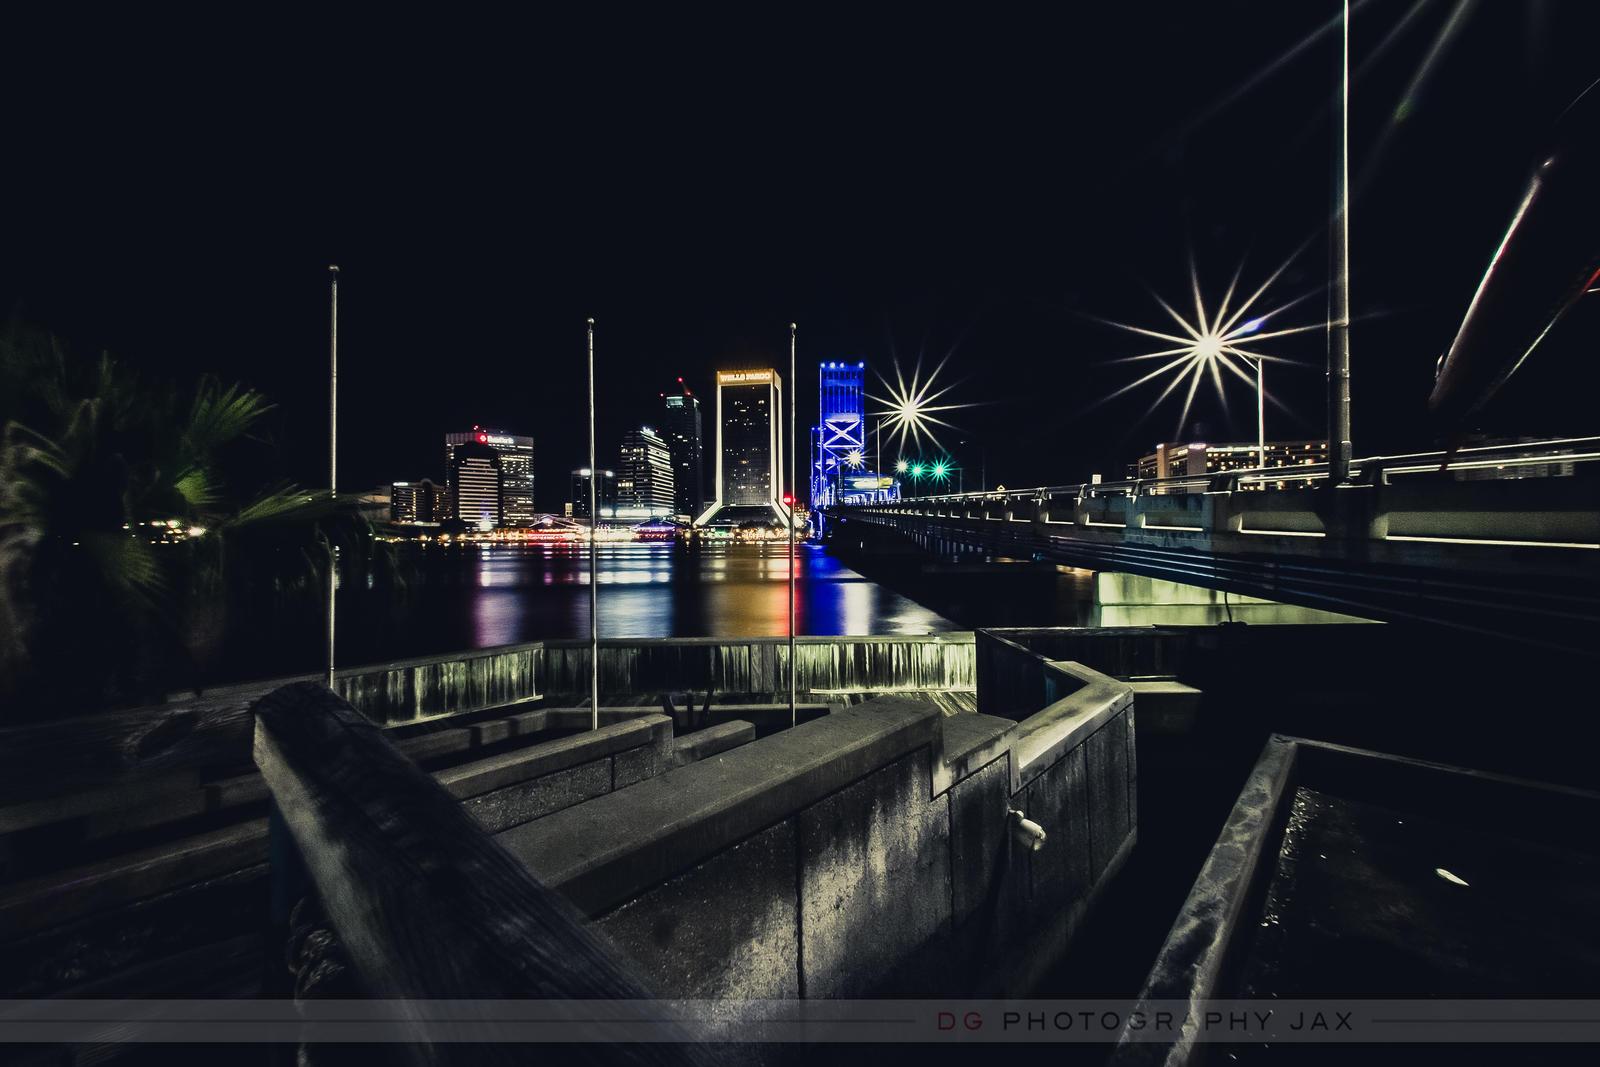 Jville City Lights by RoyalImageryJax